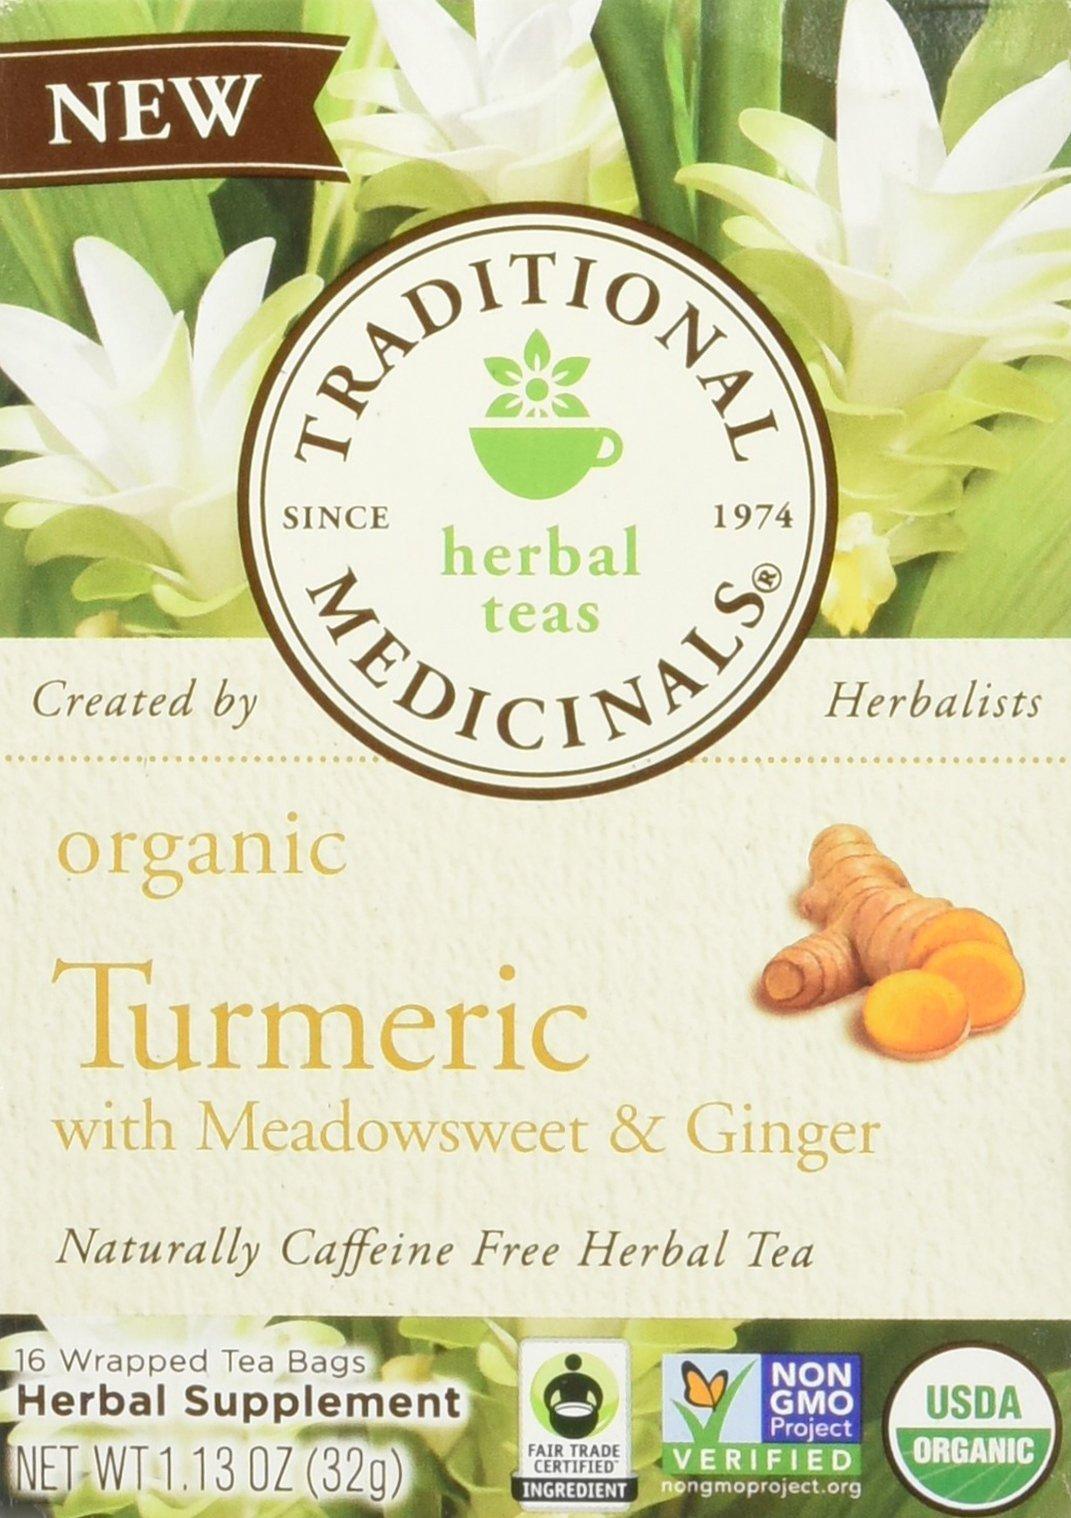 Traditional Medicinals Tea Turmeric Midwest Ginger Organic, 16 ct